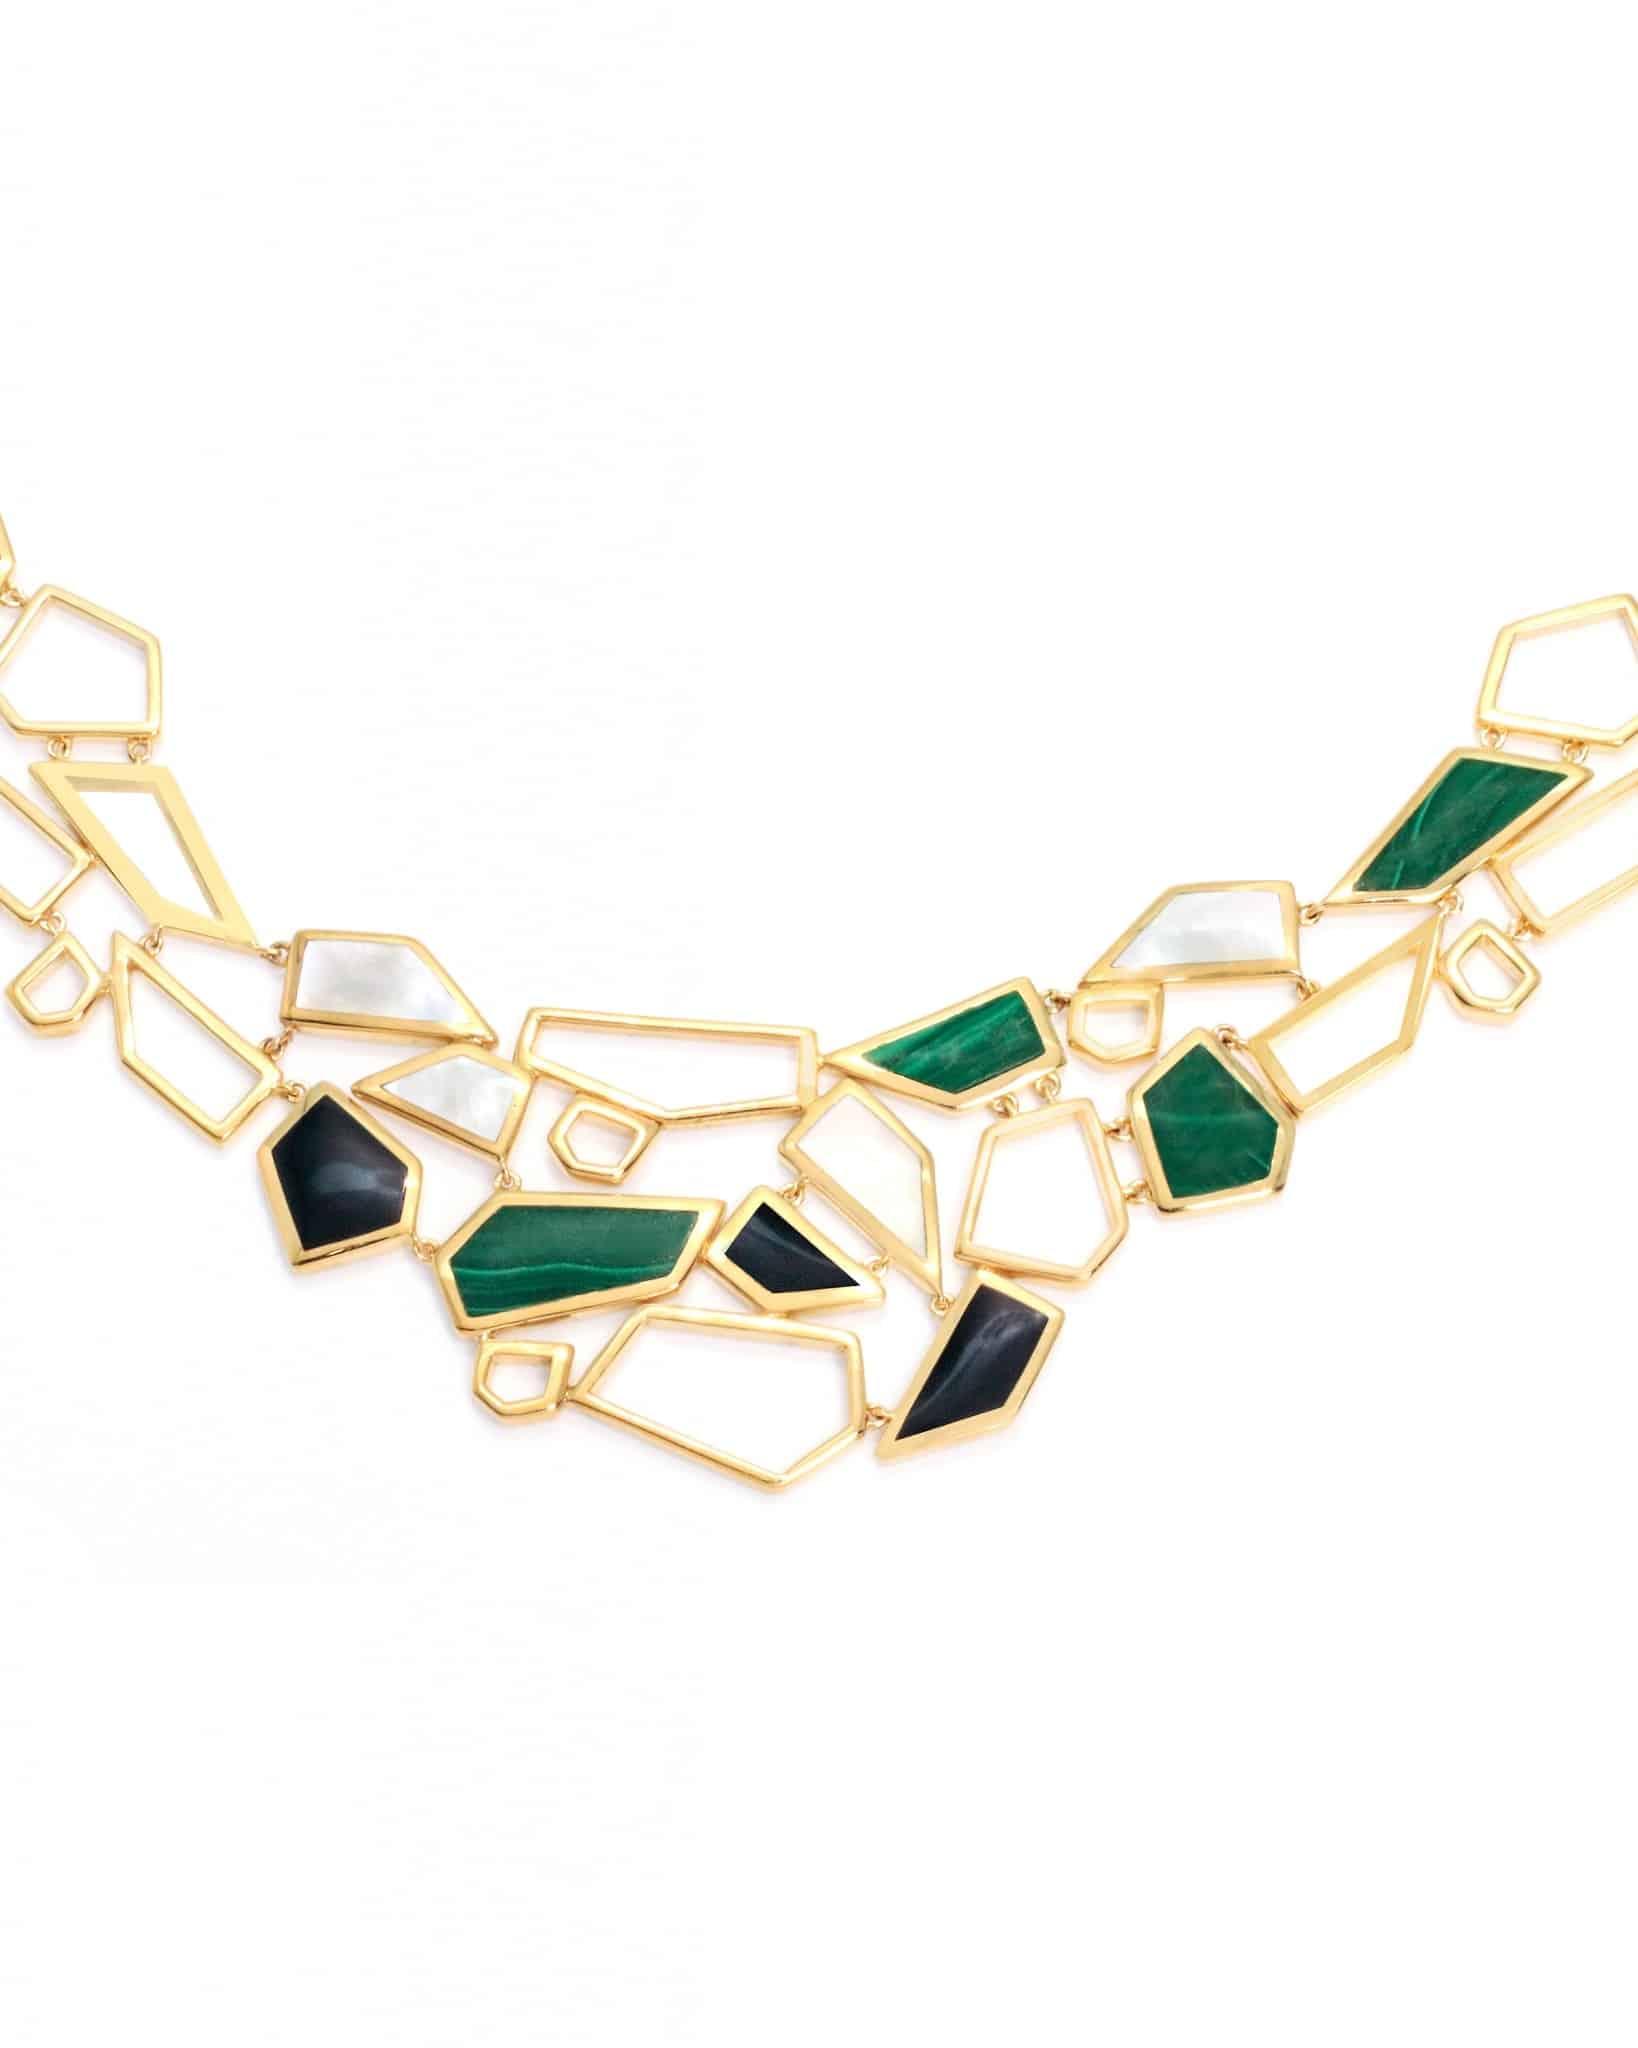 Ippolita 18k Gold Polished Rock Candy Necklace GN668SERA